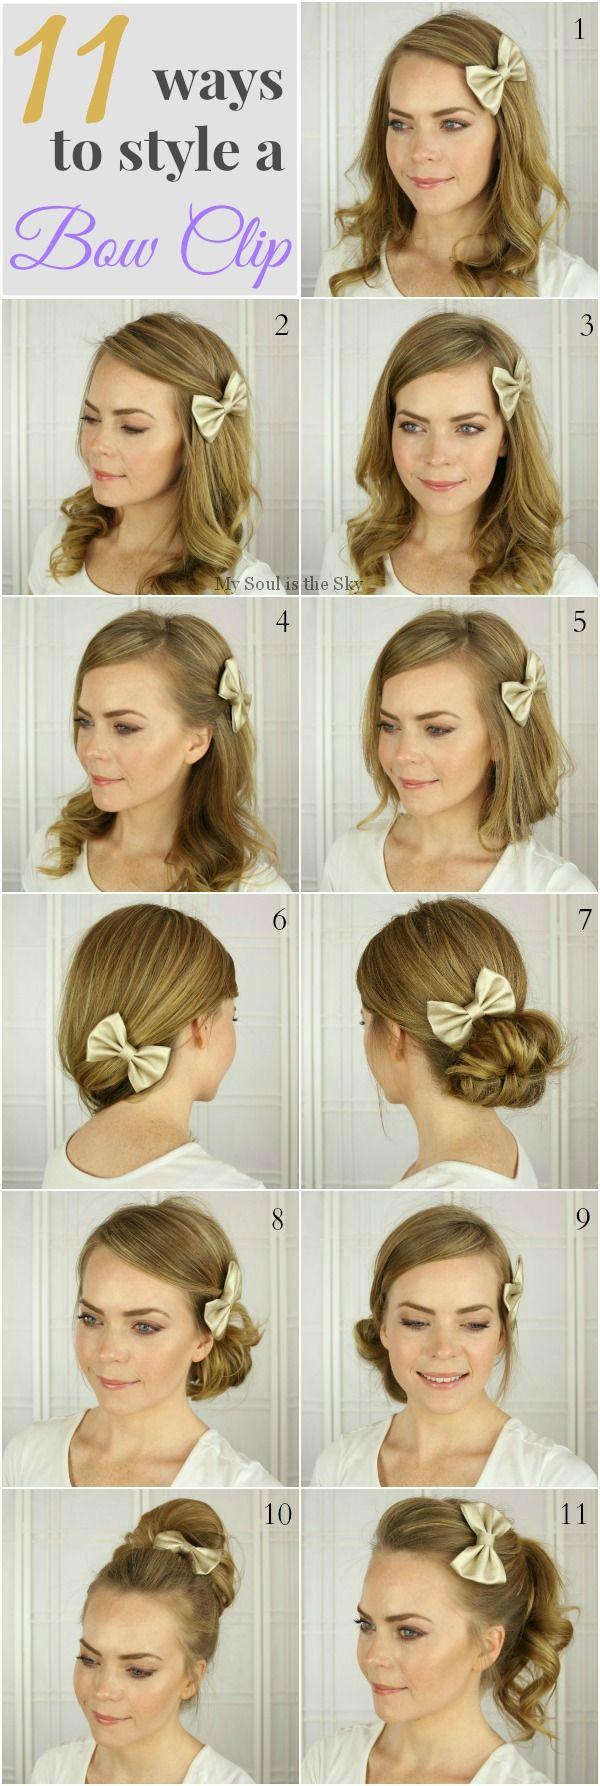 Pleasant 1000 Ideas About Bow Bun Tutorials On Pinterest Bow Buns Hair Short Hairstyles Gunalazisus